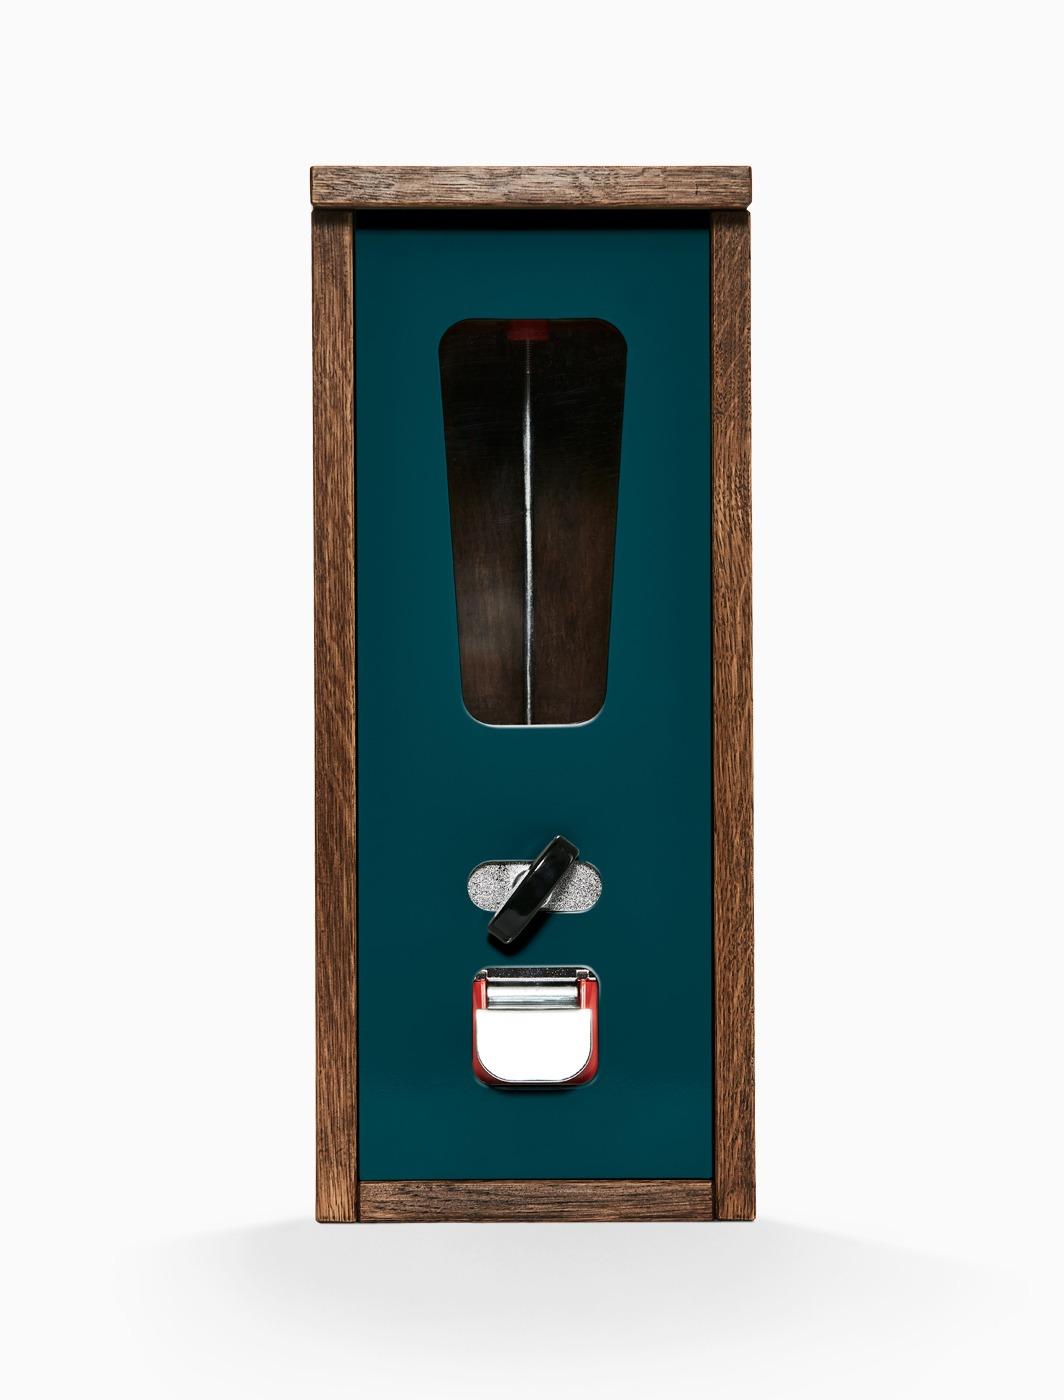 Käues-Automat mit dunklem Holzkorpus und ozeanblauer Frontplatte